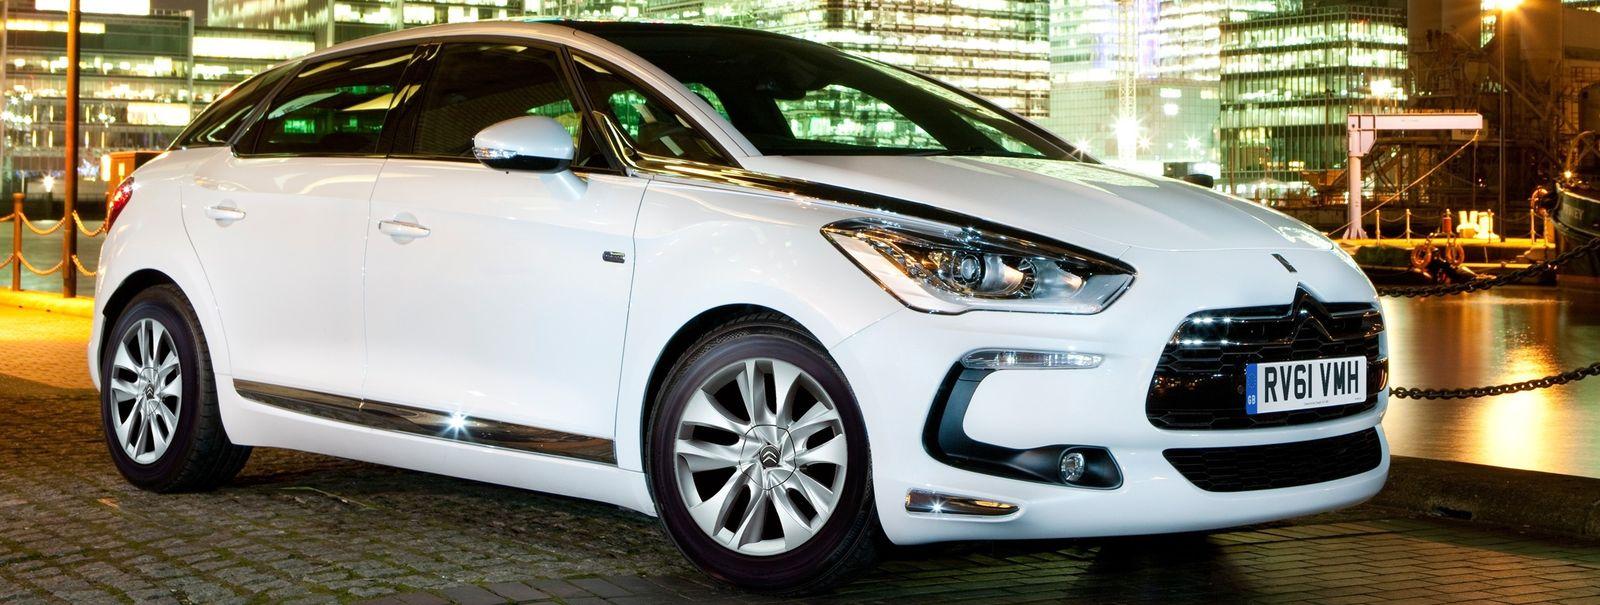 10 best hybrid cars on sale in the uk carwow. Black Bedroom Furniture Sets. Home Design Ideas